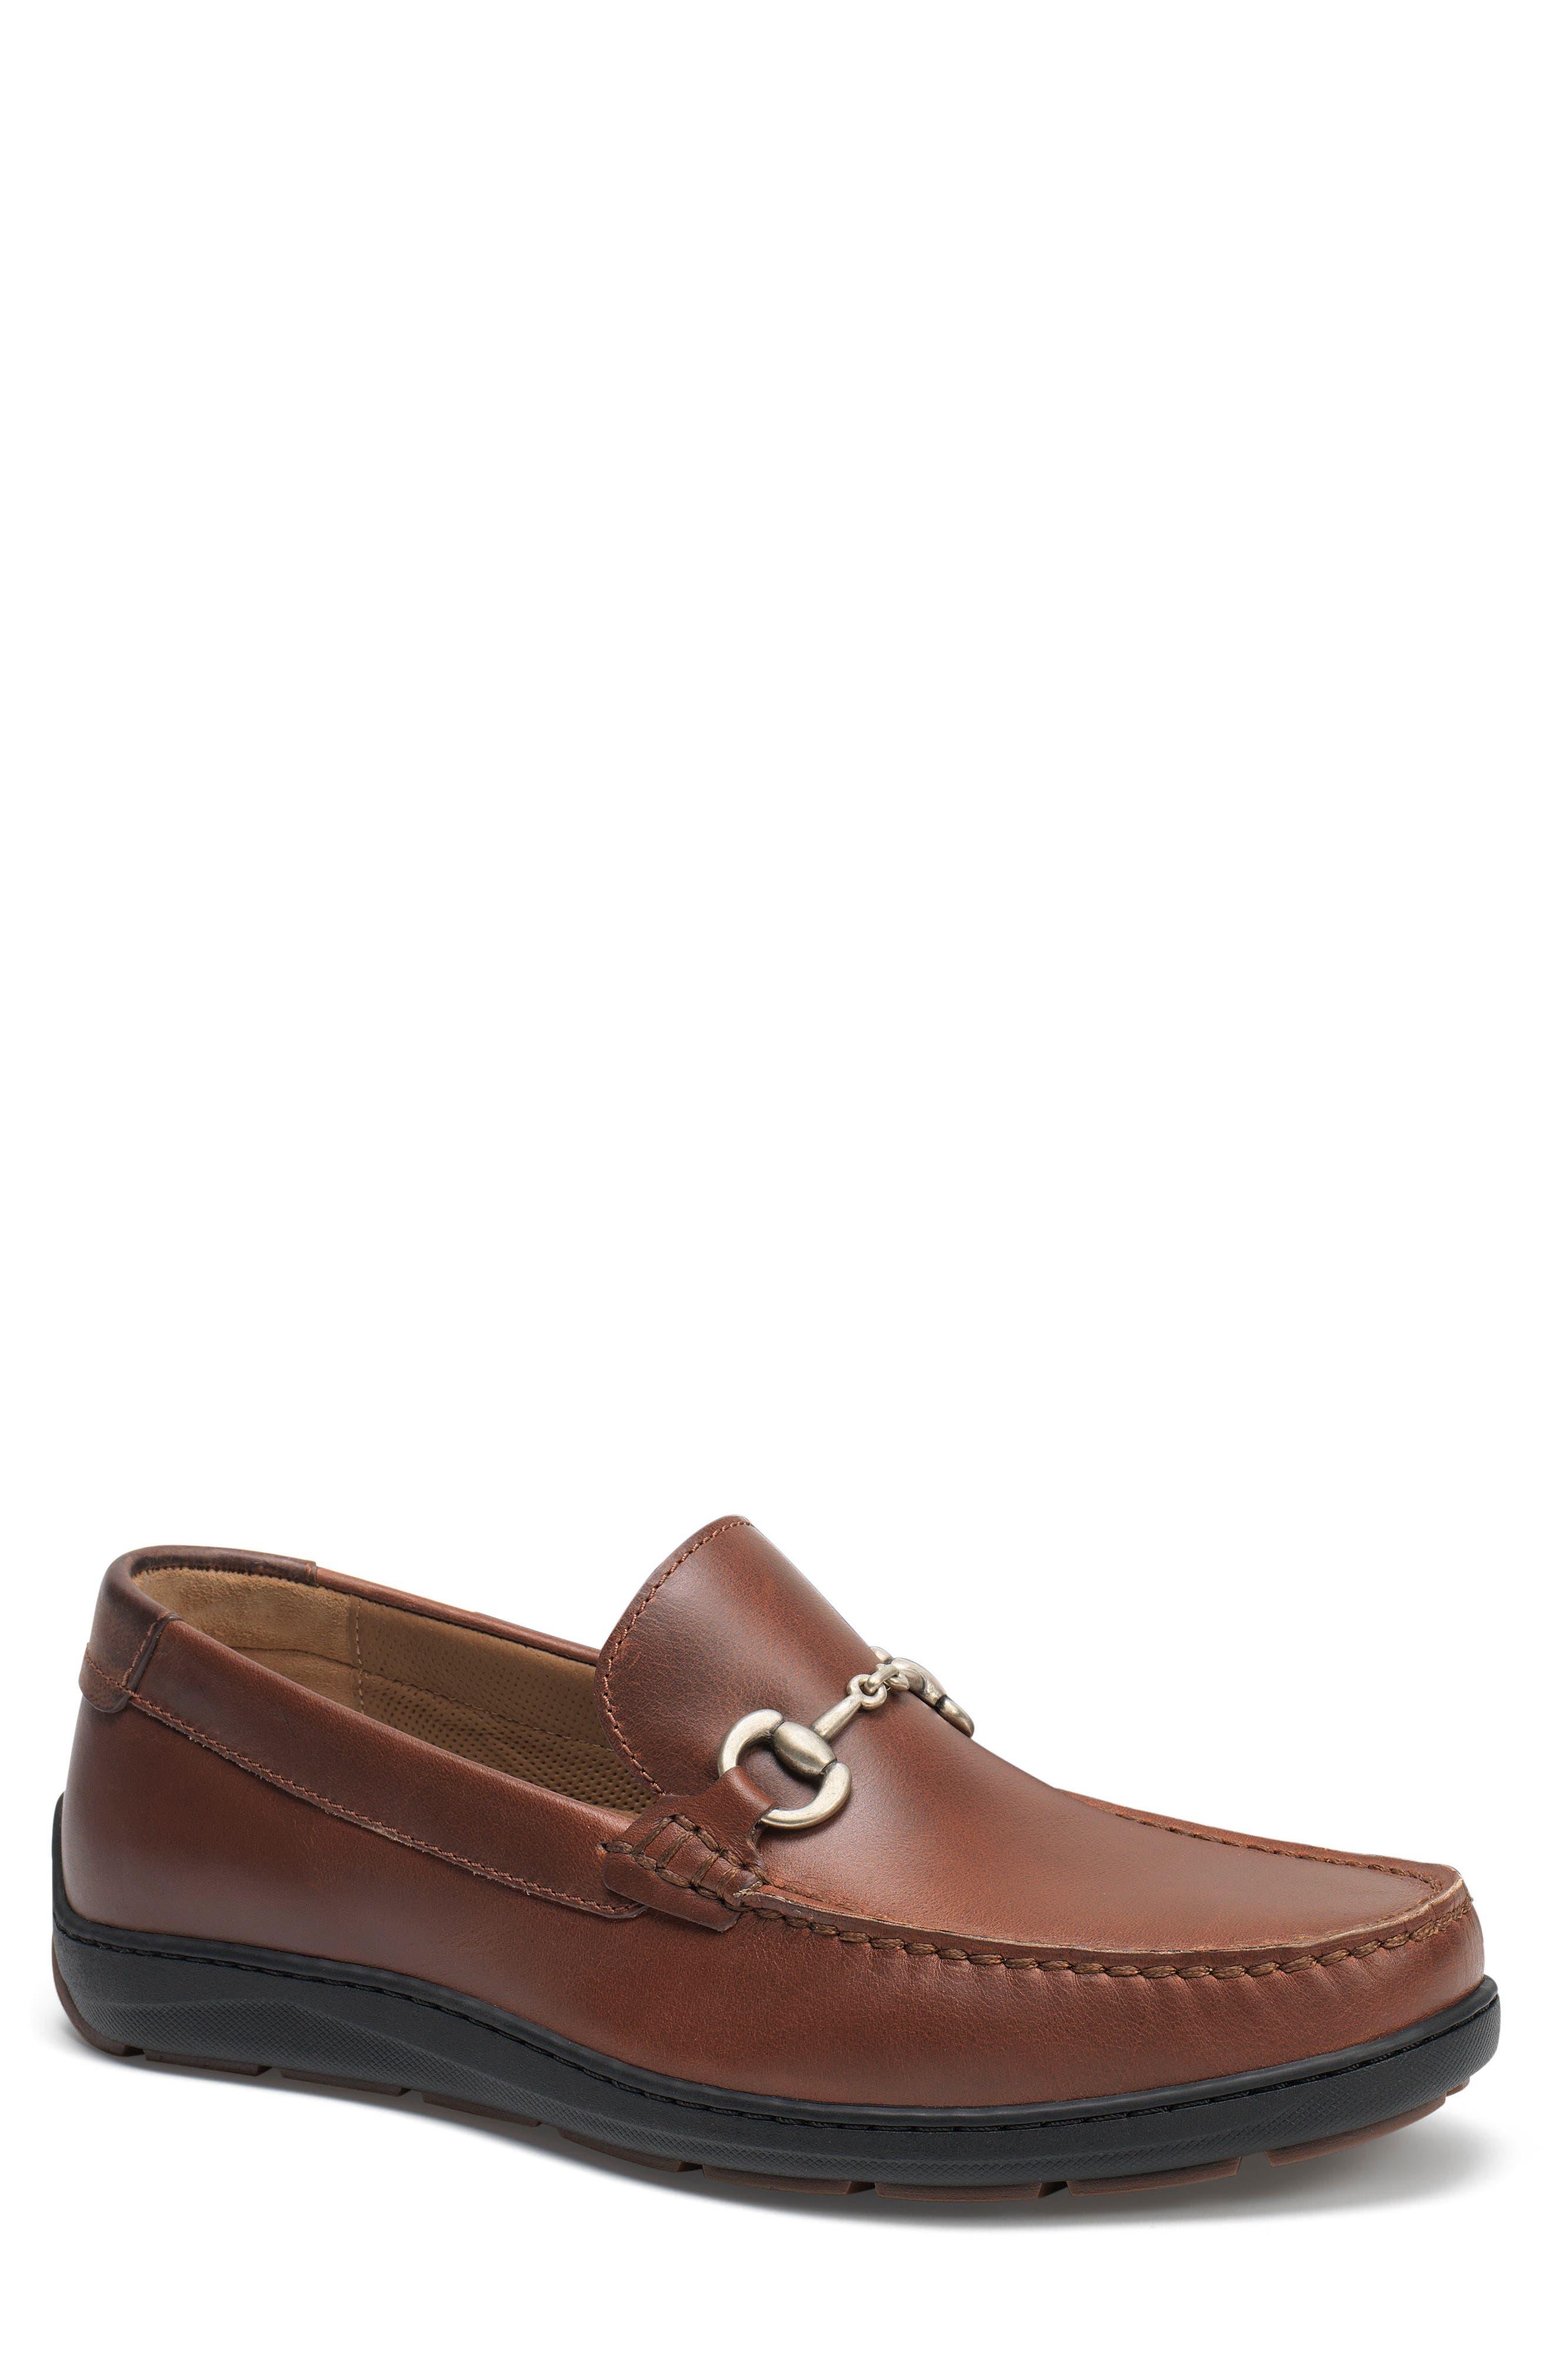 Stalworth Bit Loafer,                         Main,                         color, Brandy Leather